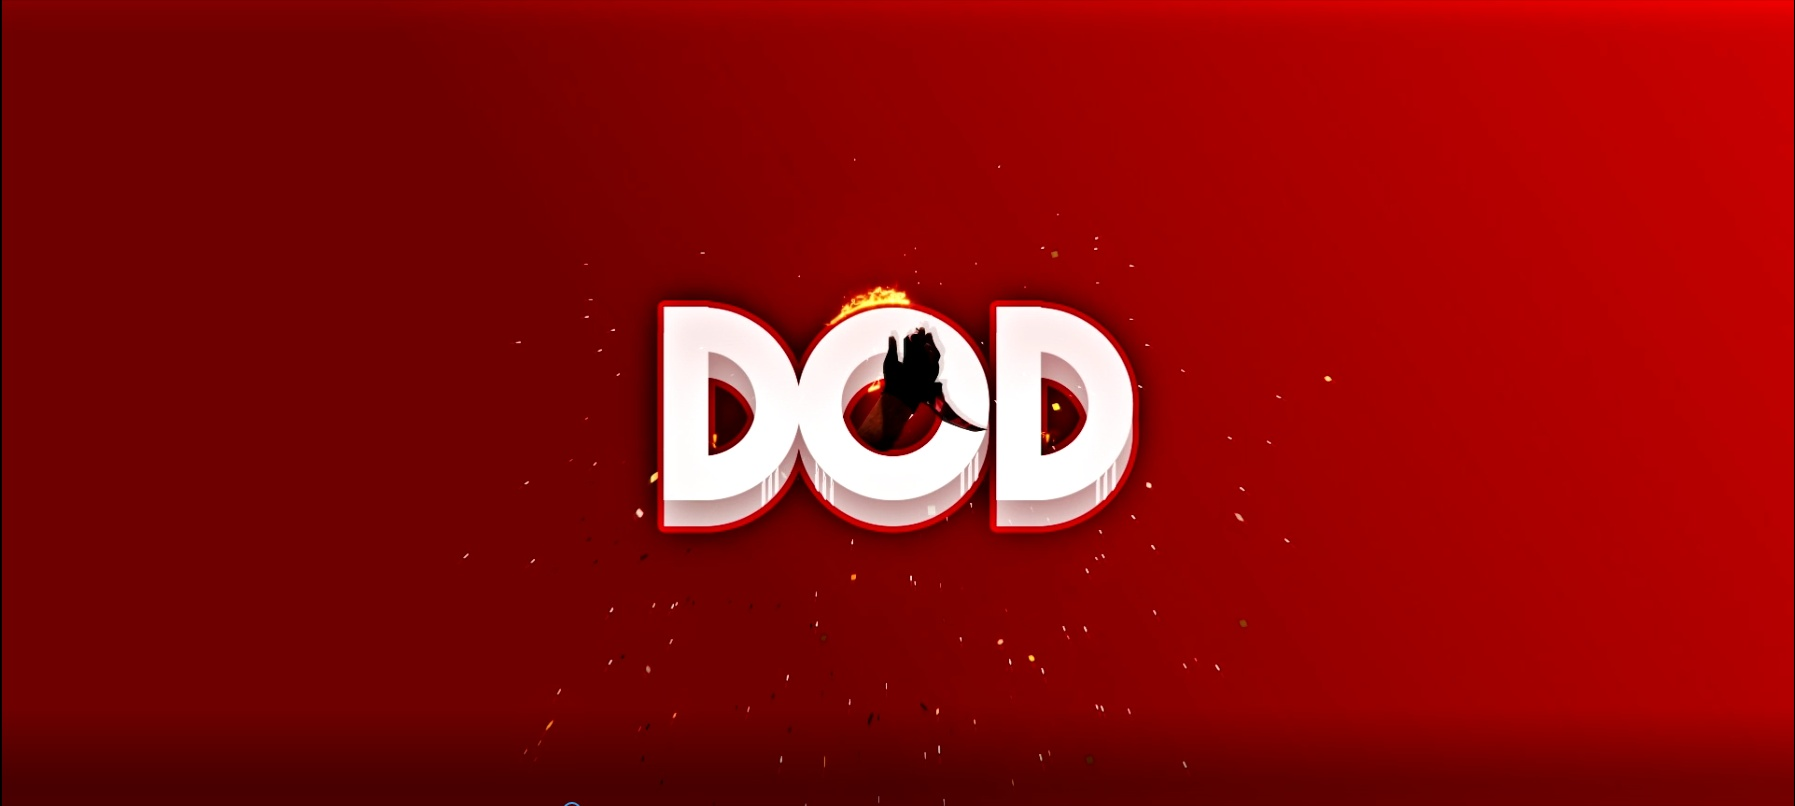 2D Intro |   Csgo, Cod, Other